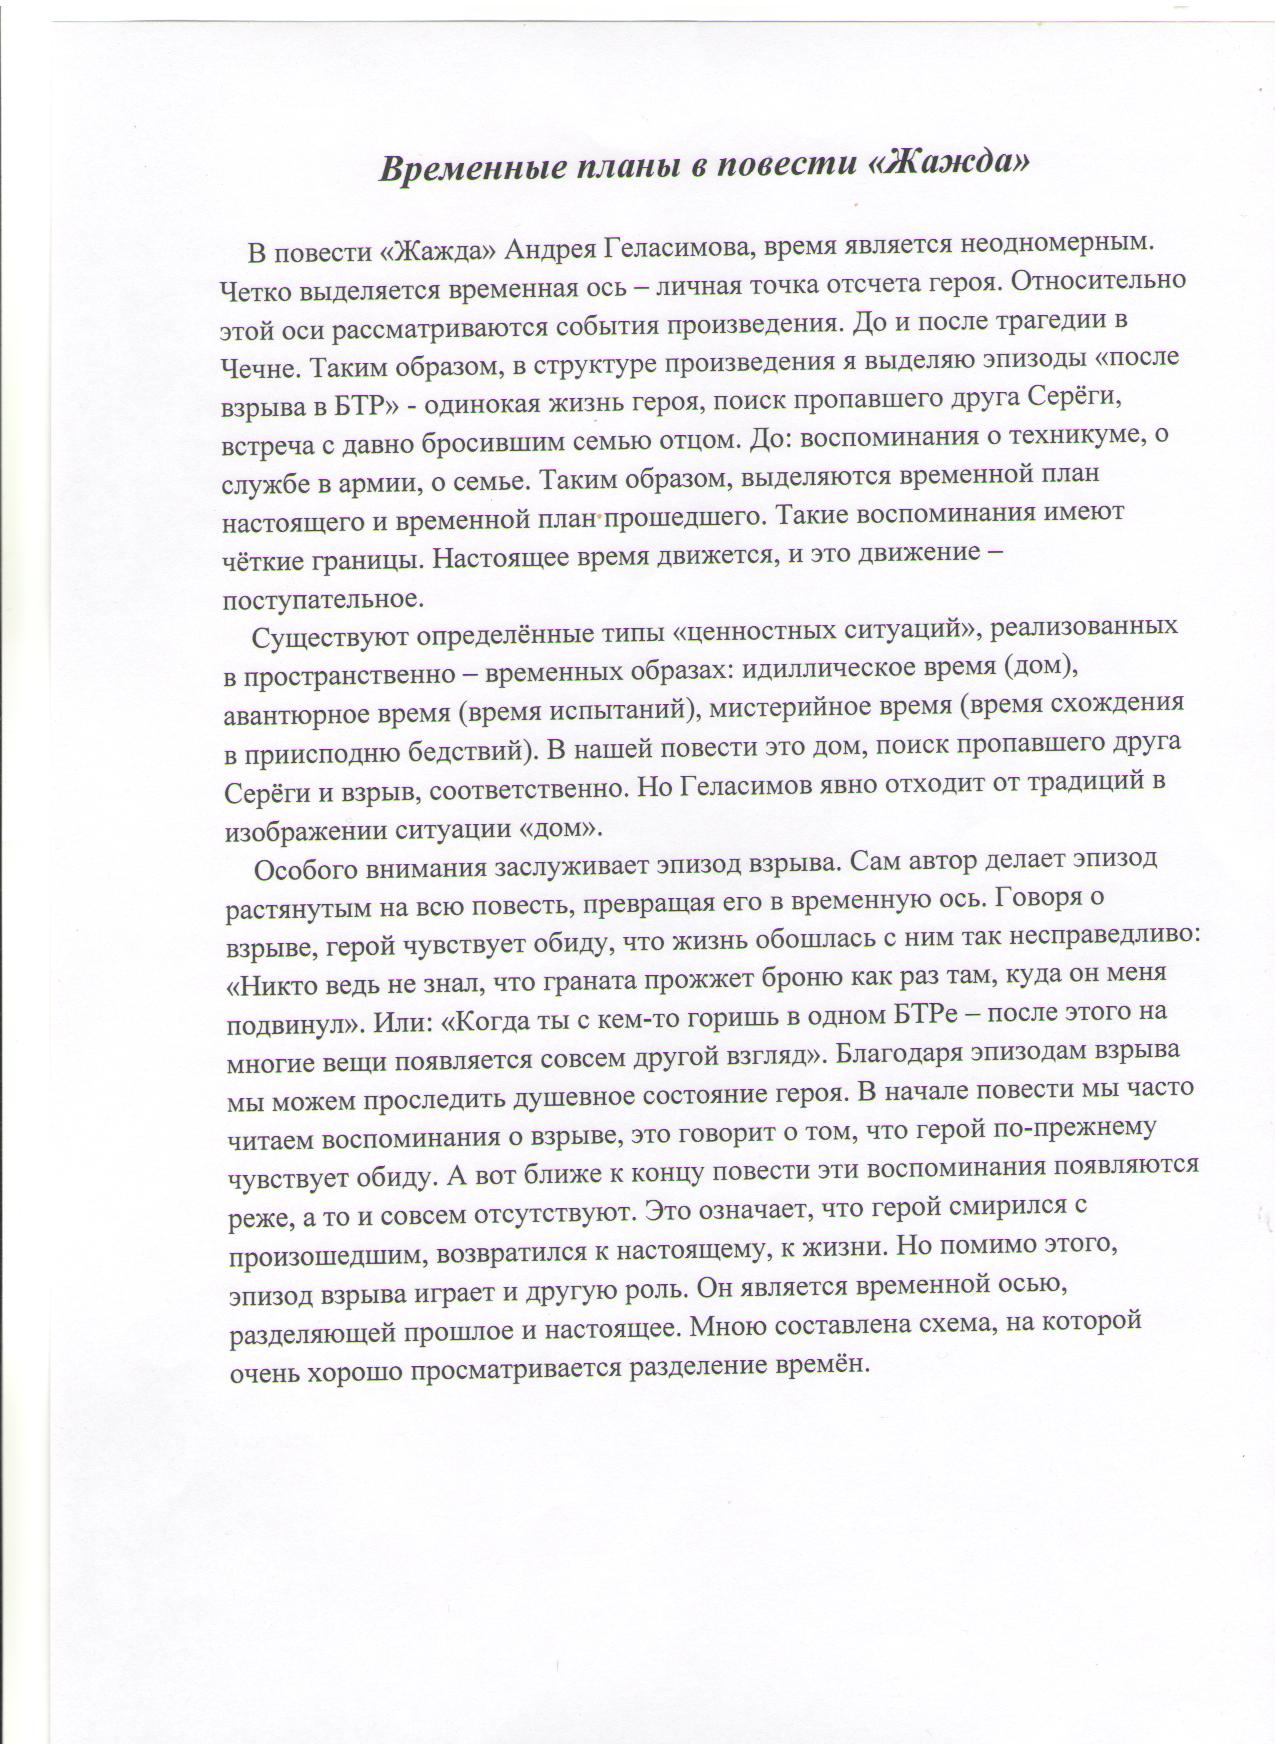 C:\Documents and Settings\Иван\Рабочий стол\gtlcjdtn\изображение 004.jpg